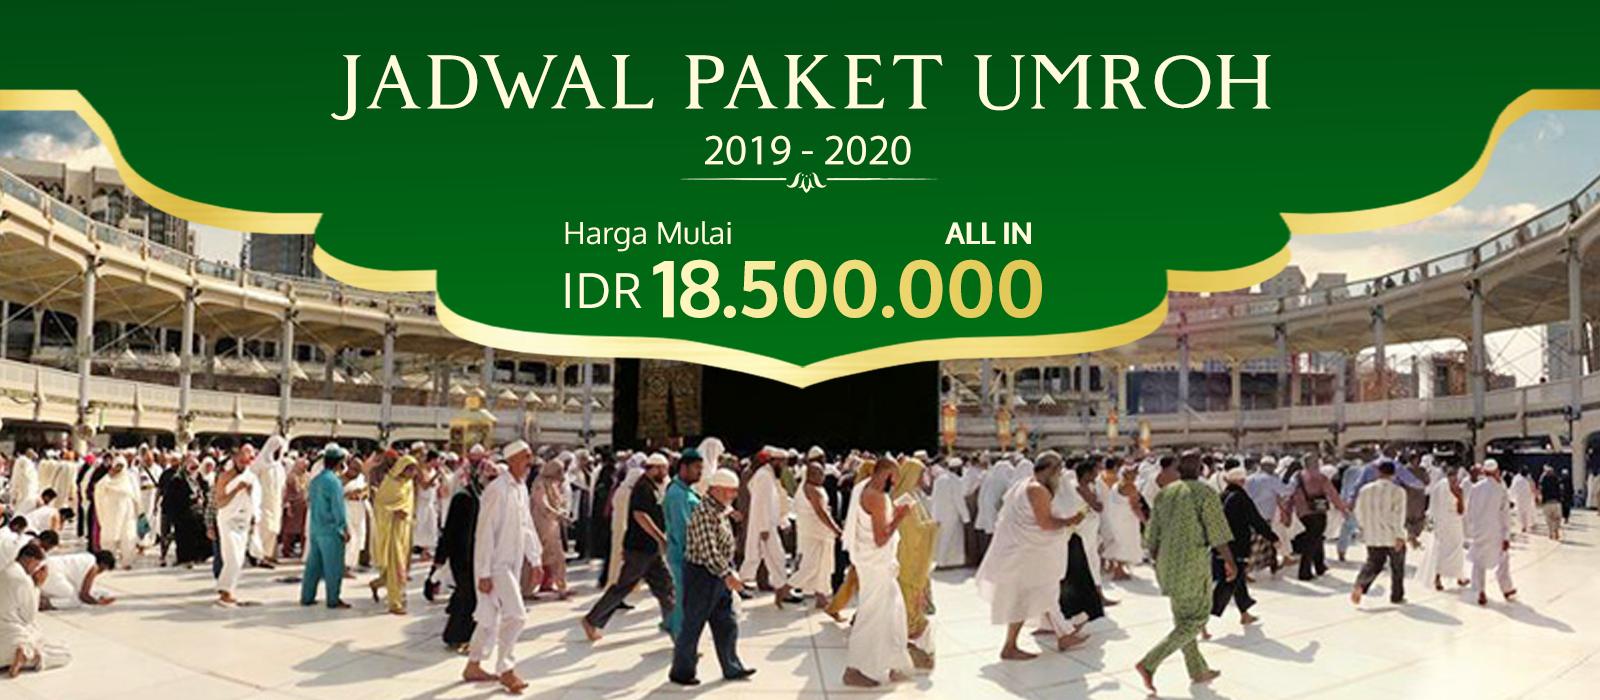 Jadwal Umroh Tahun 2019 - 2020 Biaya Paket Promo